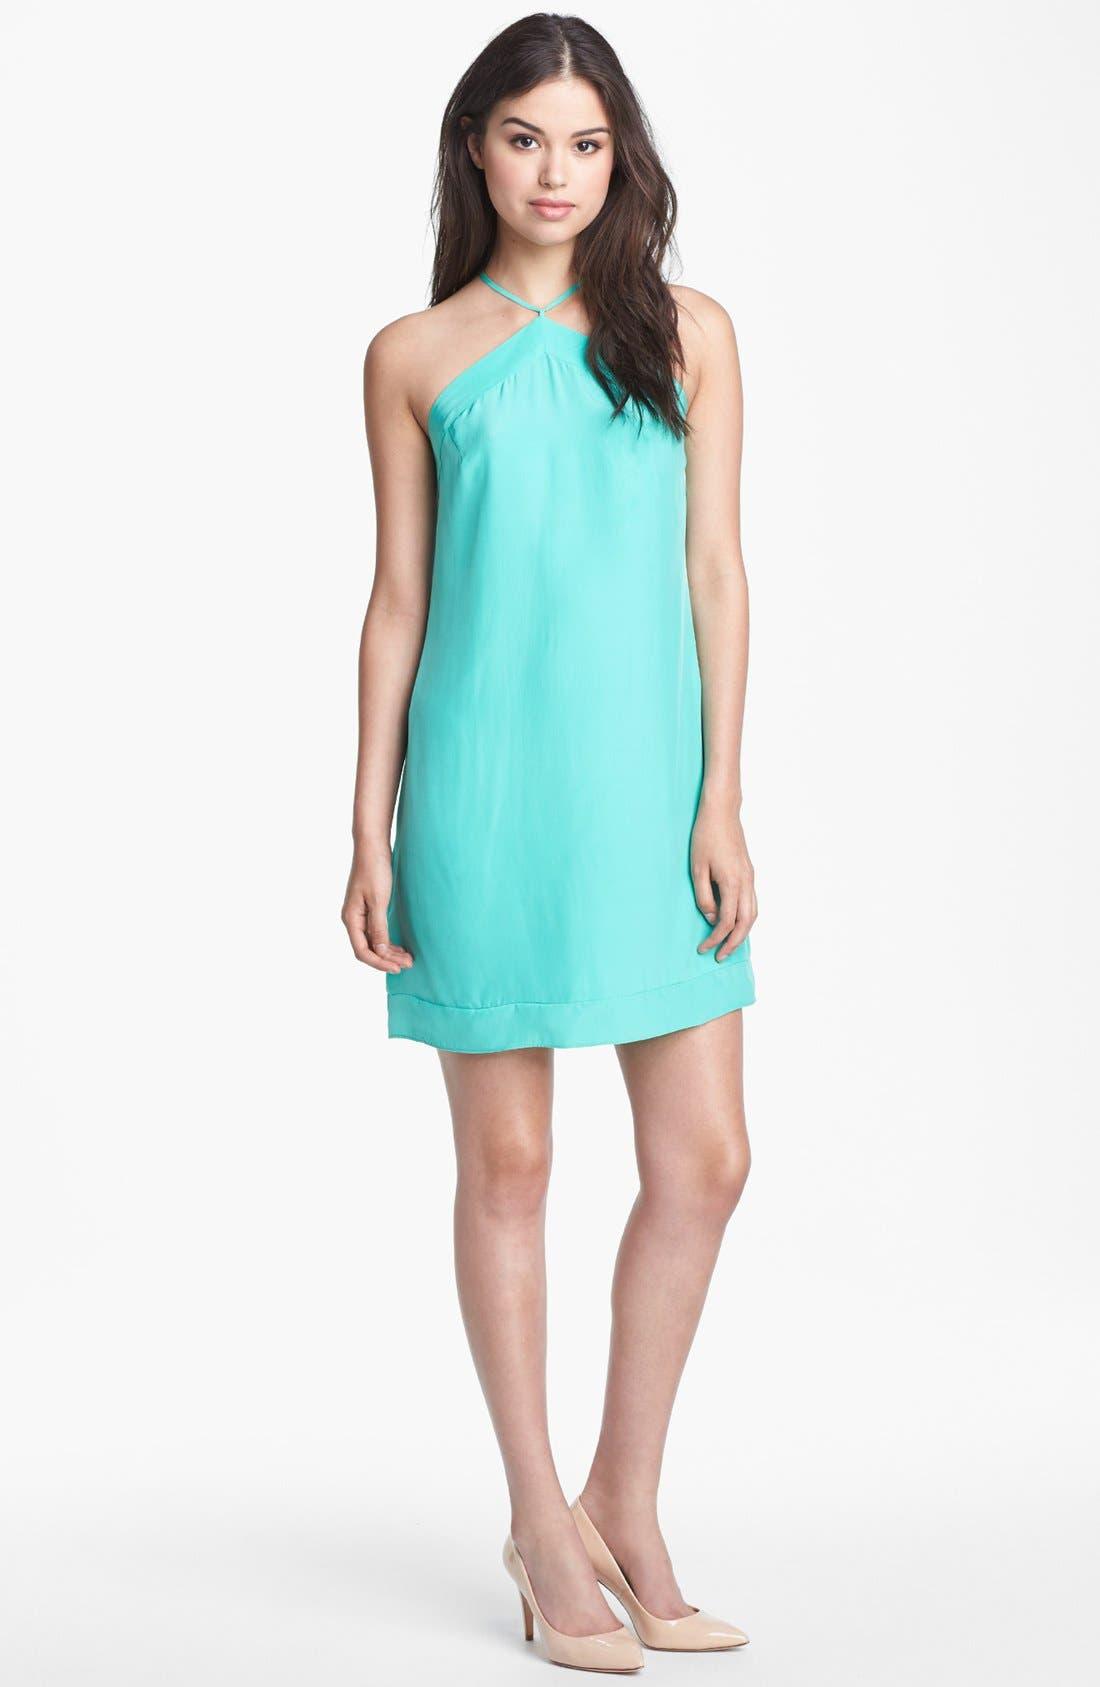 ALICE & TRIXIE 'Silvie' Silk Dress, Main, color, 330